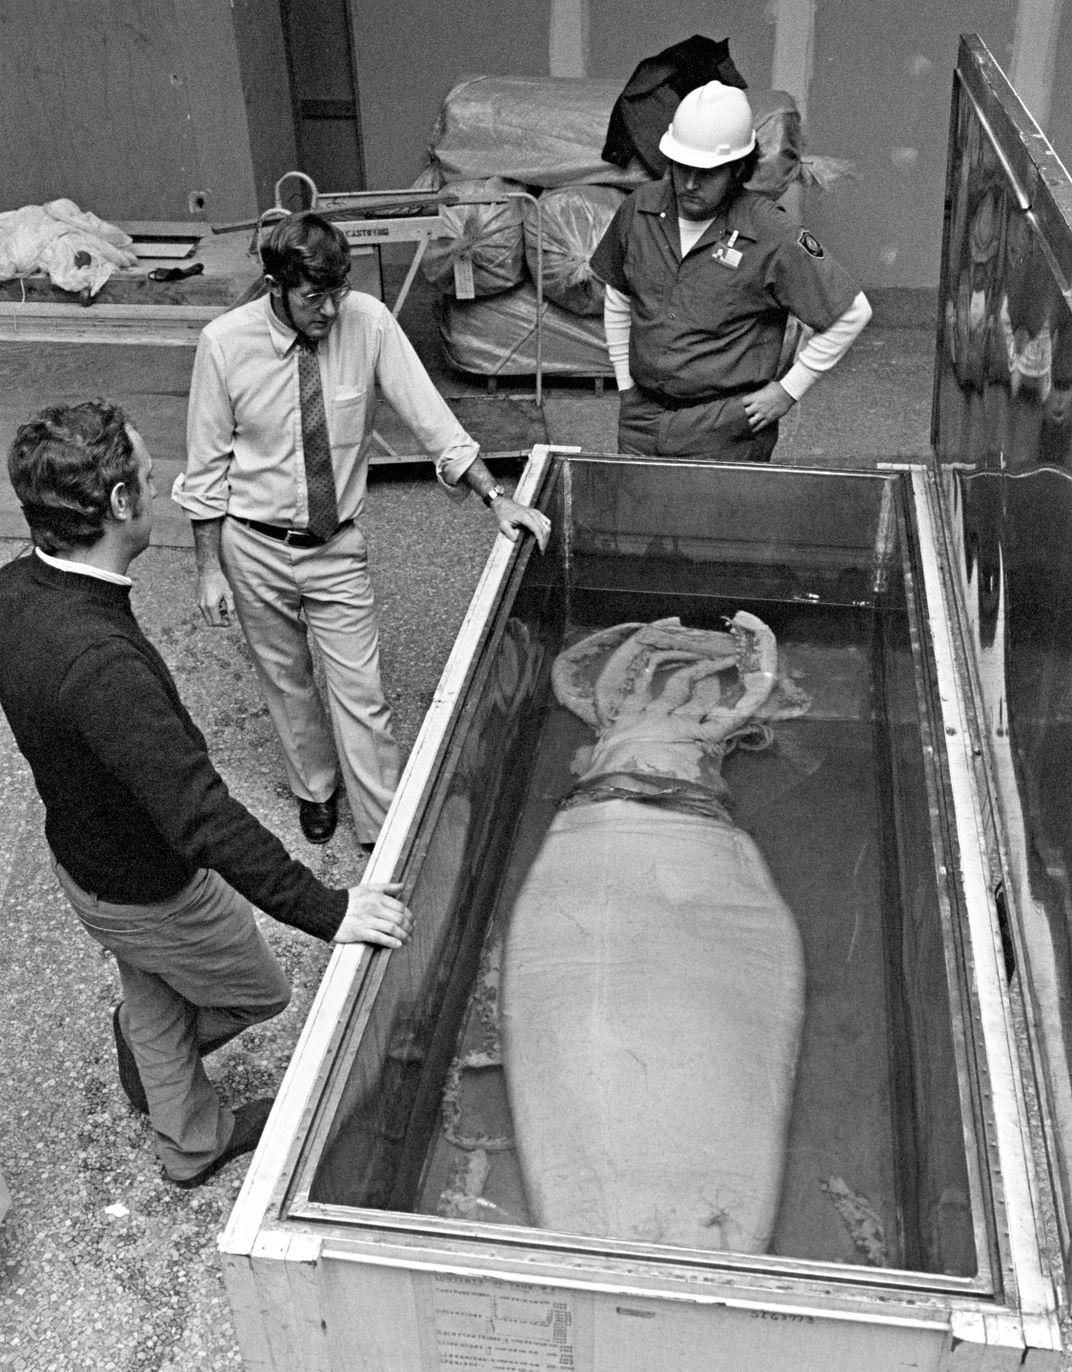 Operation Calamari: How the Smithsonian Got Its Giant Squids